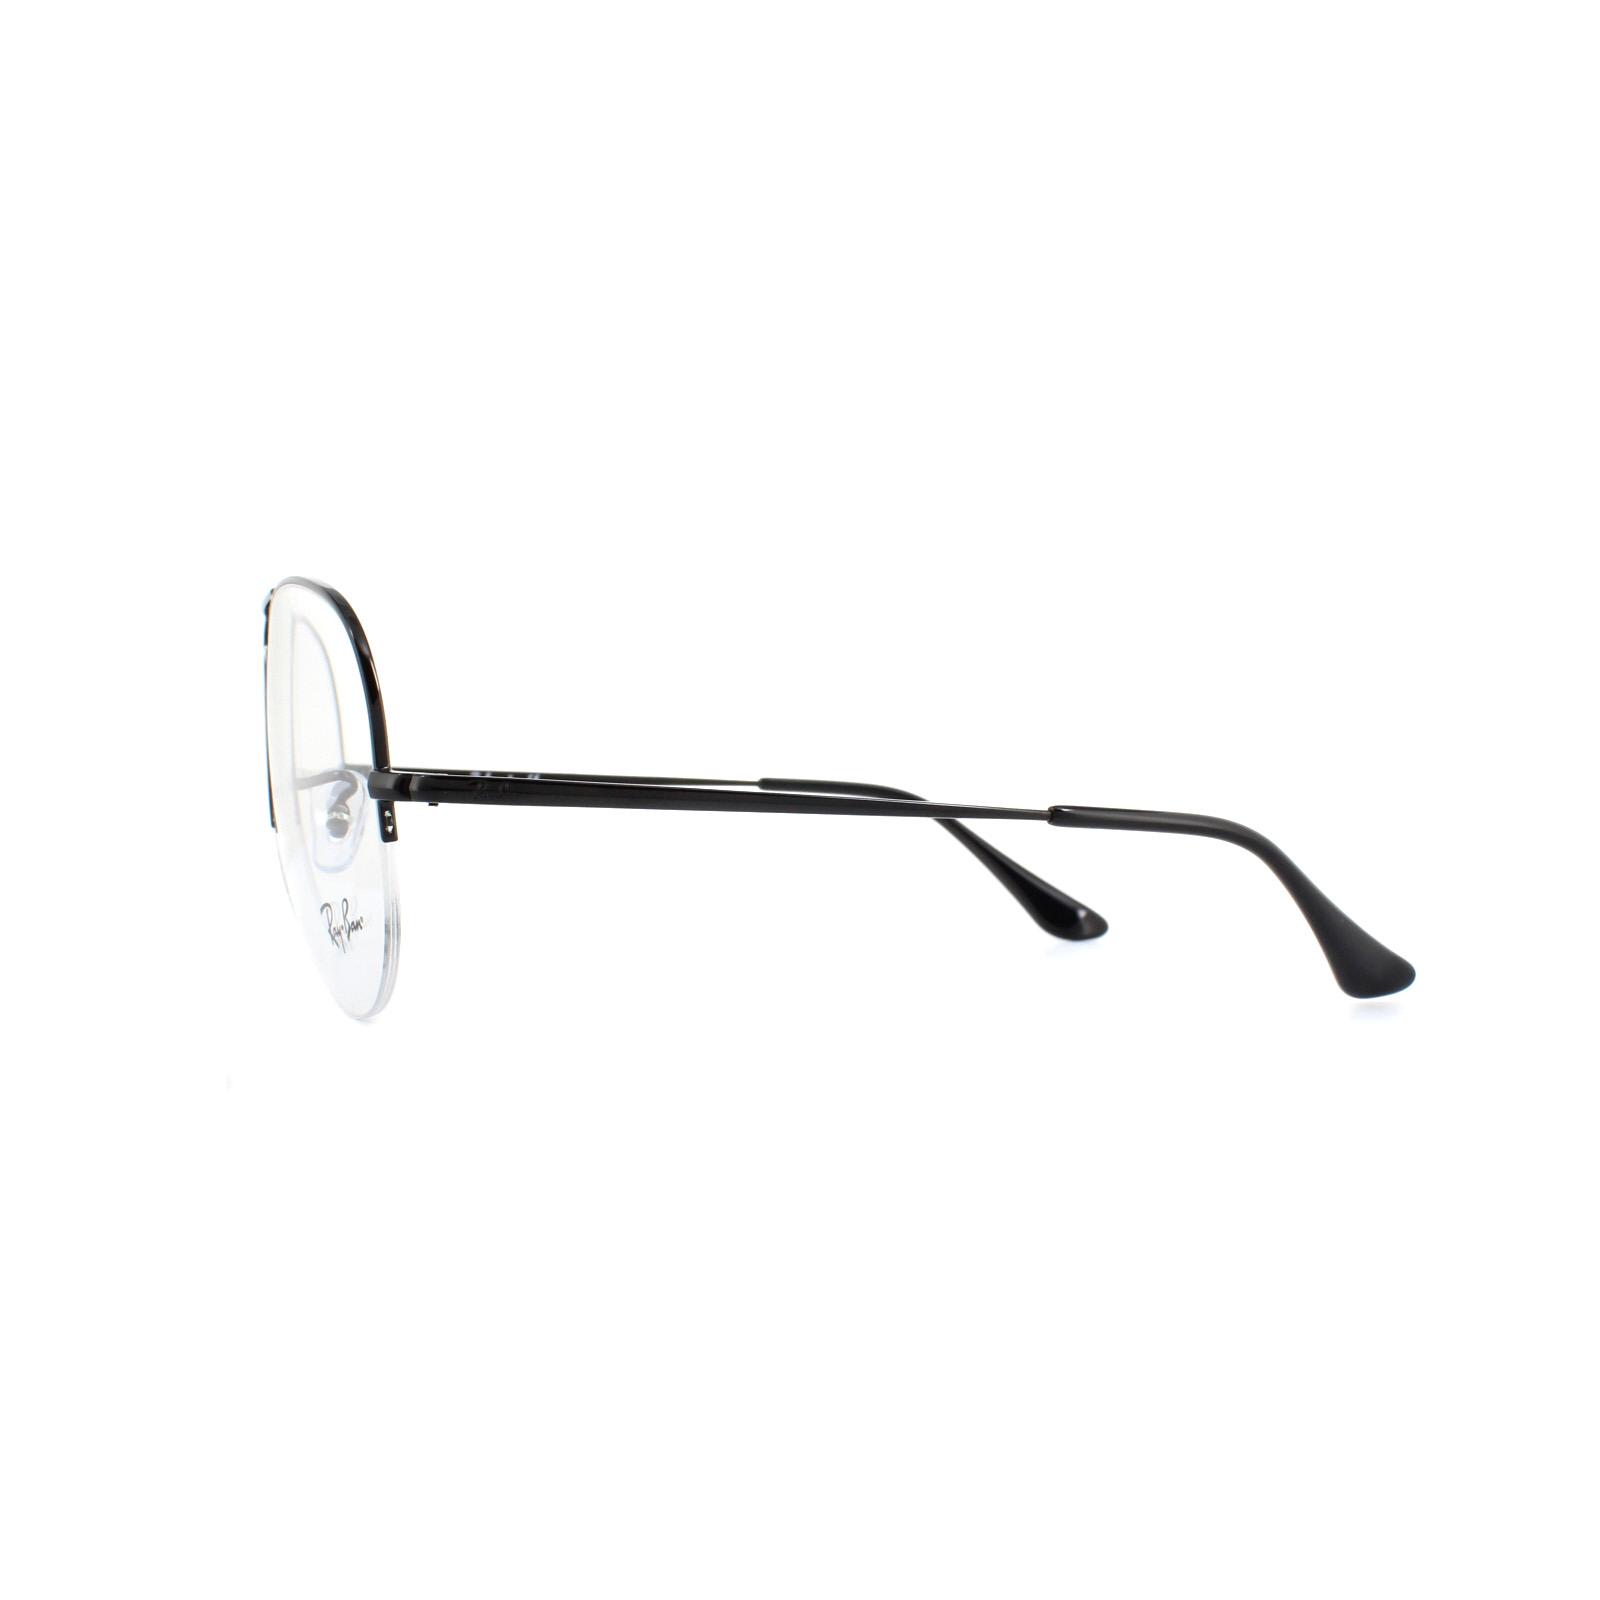 996e9d27334 Ray-Ban Glasses Frames 6589 2509 Black 59mm 8053672864151